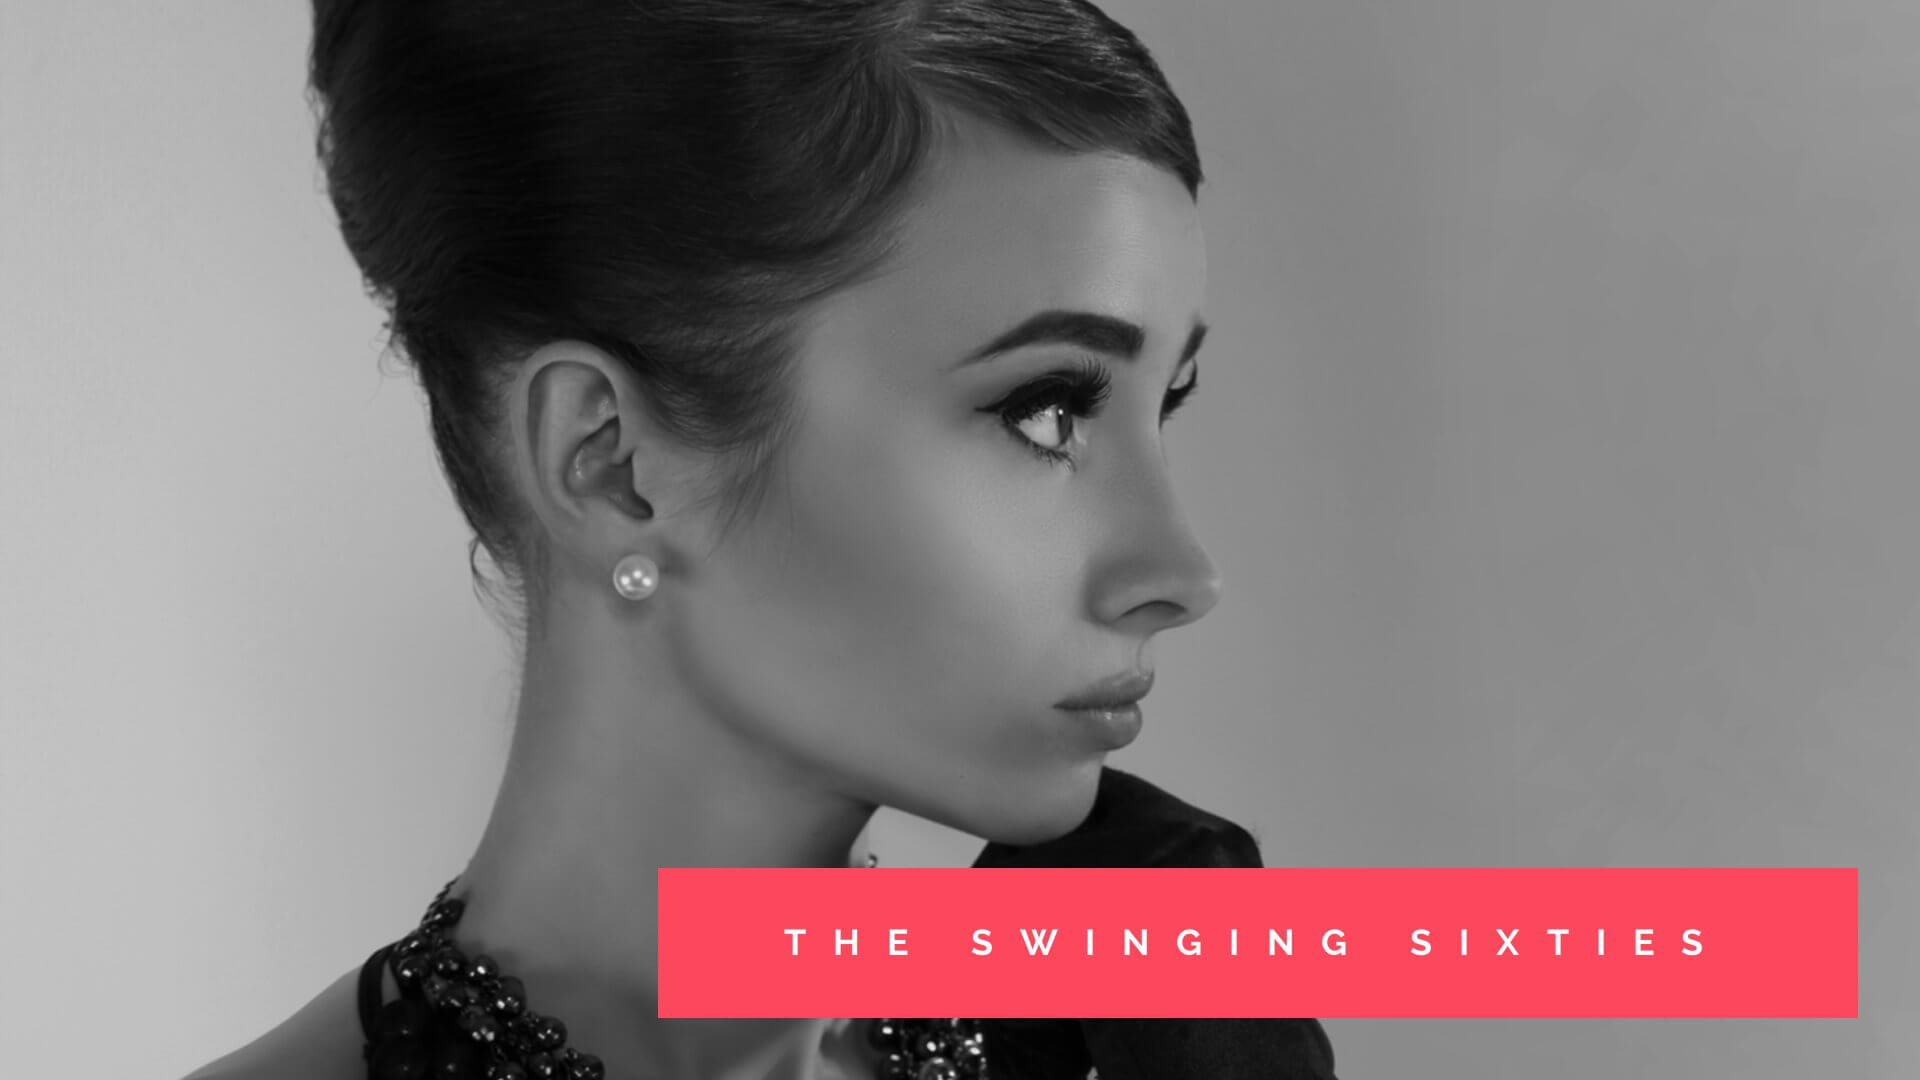 1960: The Swinging Sixties